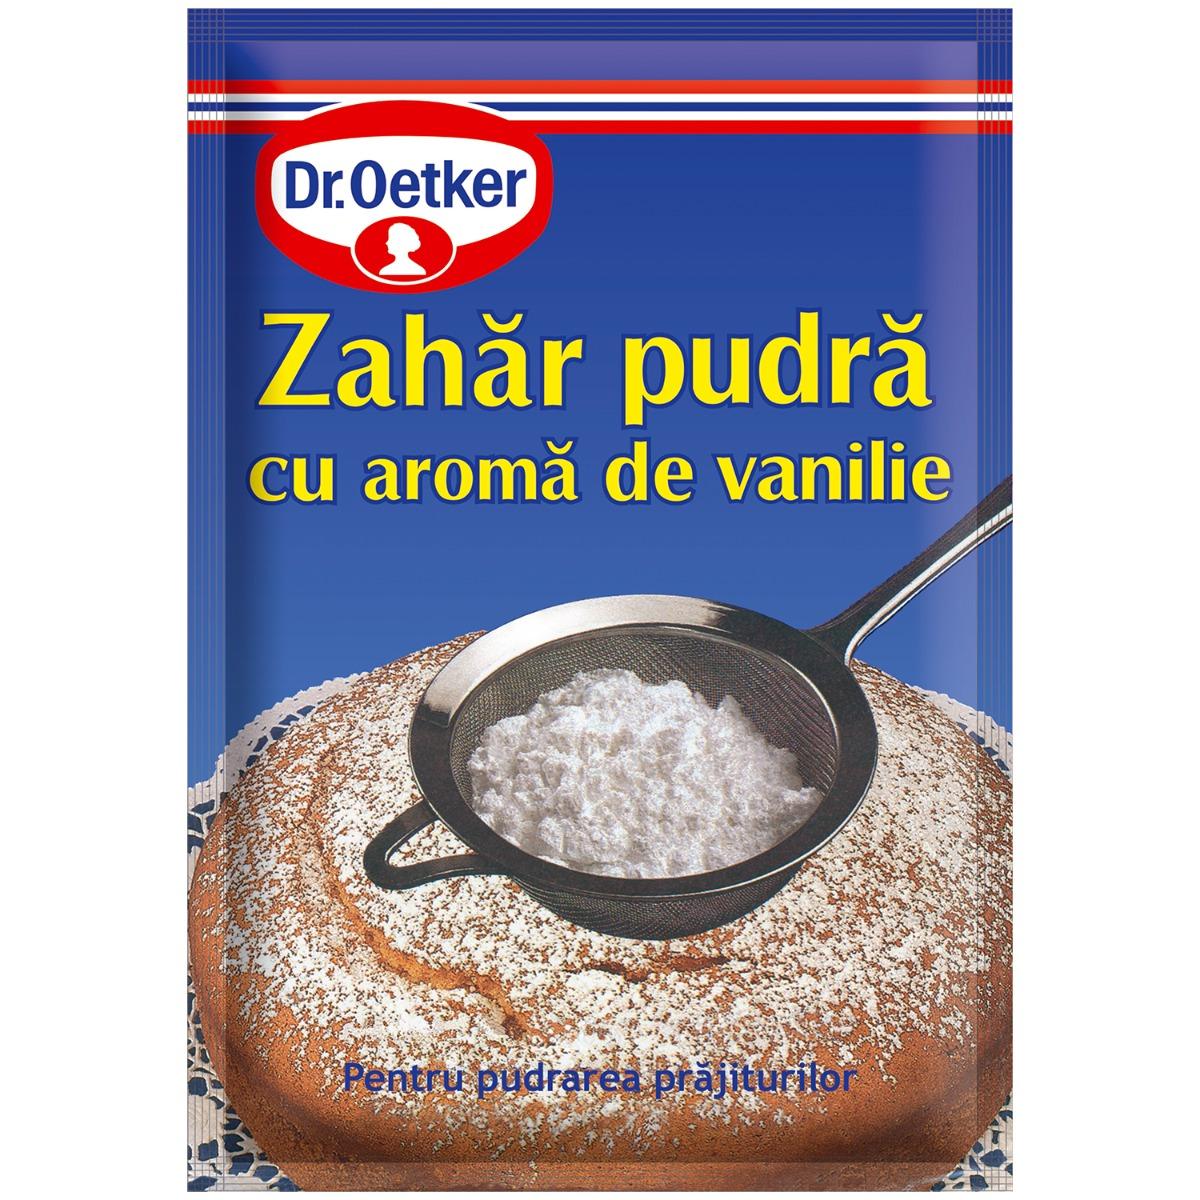 Zahar pudra cu aroma de vanilie Dr Oetker, 80 g imagine